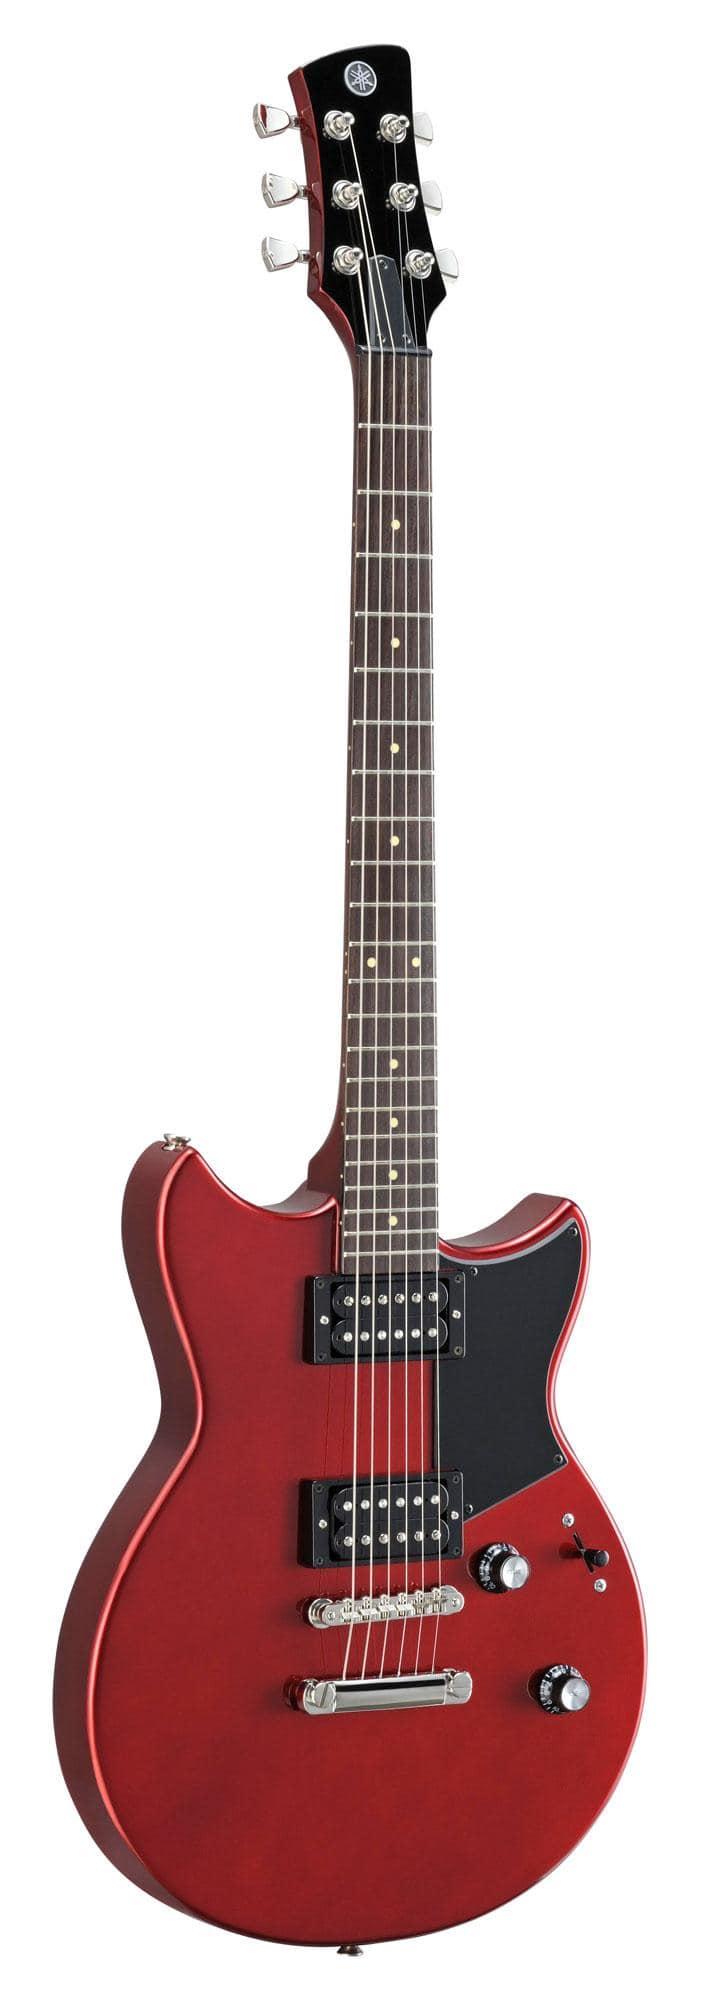 yamaha rs320rcp revstar e gitarre red copper. Black Bedroom Furniture Sets. Home Design Ideas